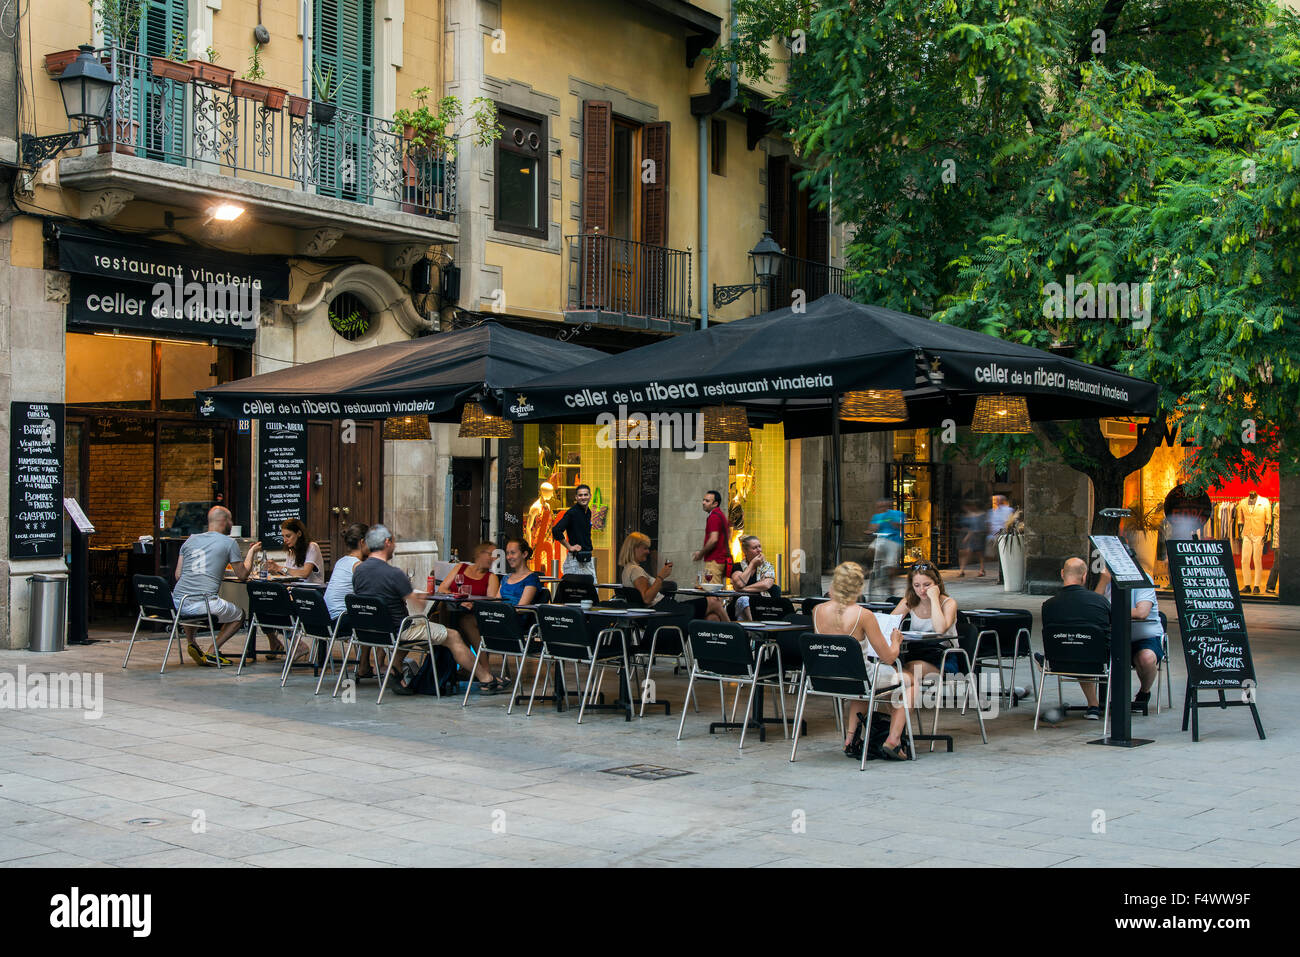 Outdoor cafe in Born quarter, Barcelona, Catalonia, Spain - Stock Image